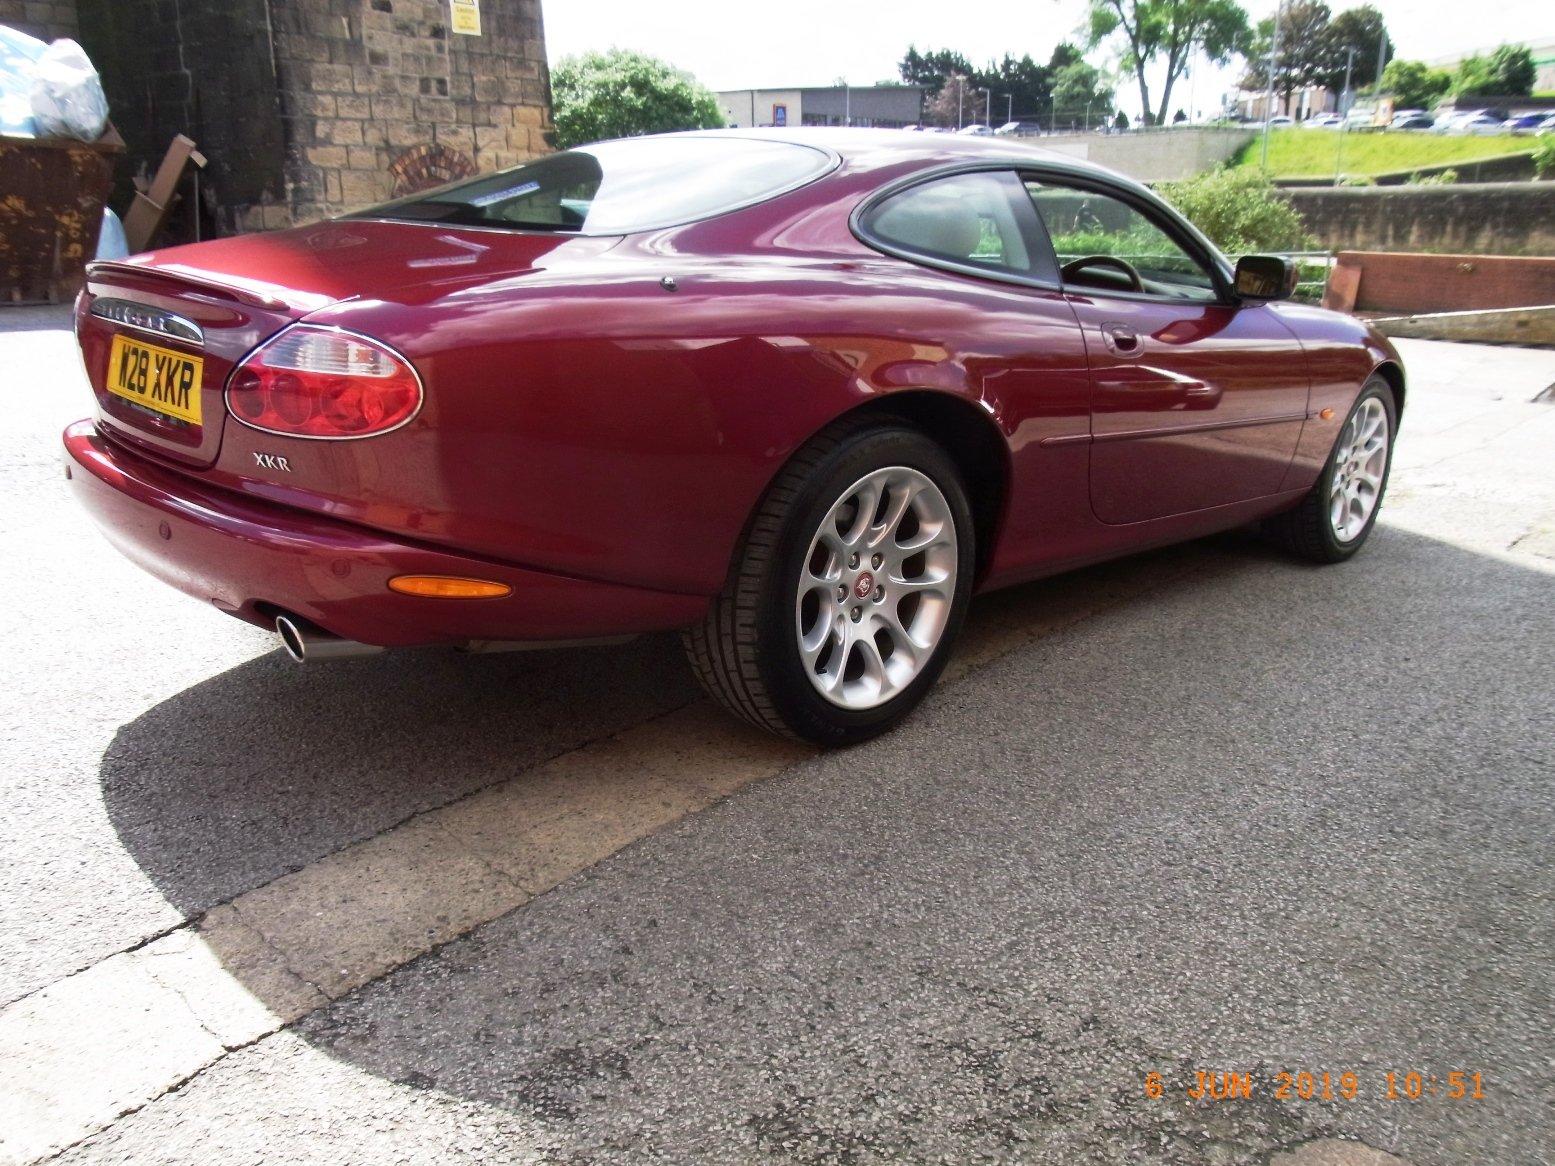 2002 Jaguar XKR 4.00 Litre Coupe For Sale (picture 4 of 6)